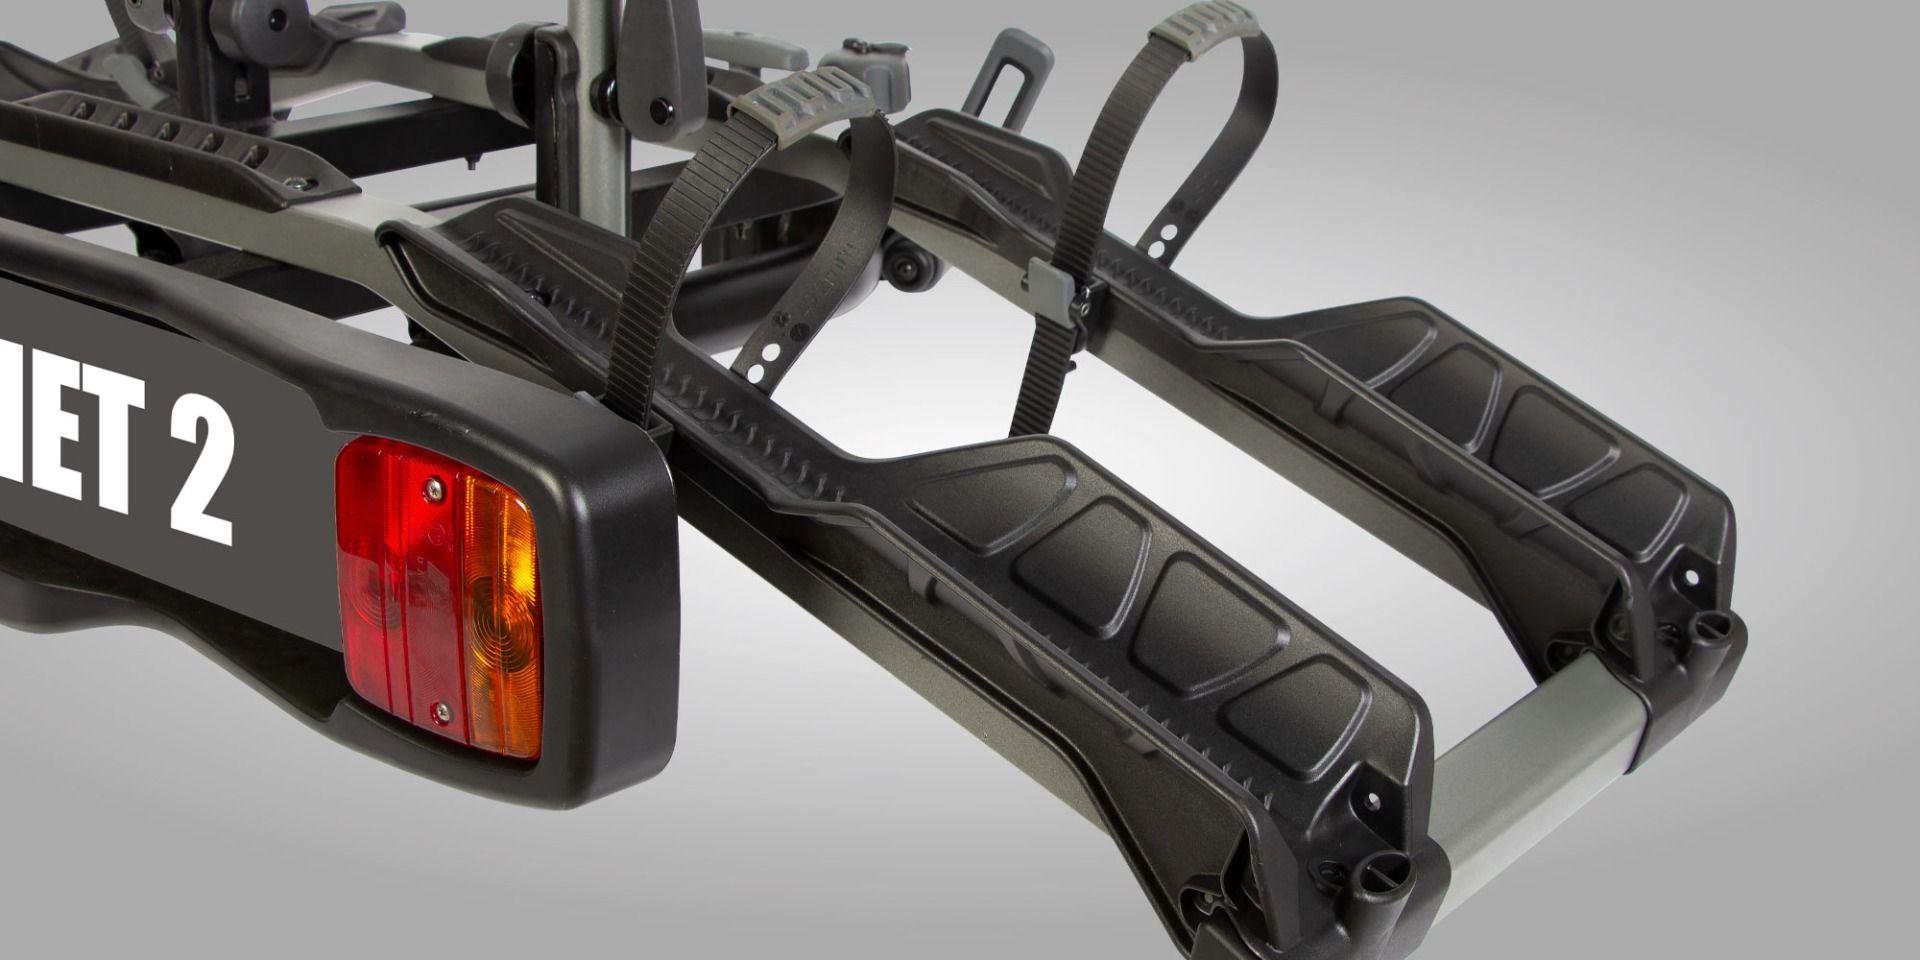 Buzzrack e-Hornet 2 Platform Tow Ball Bike Rack